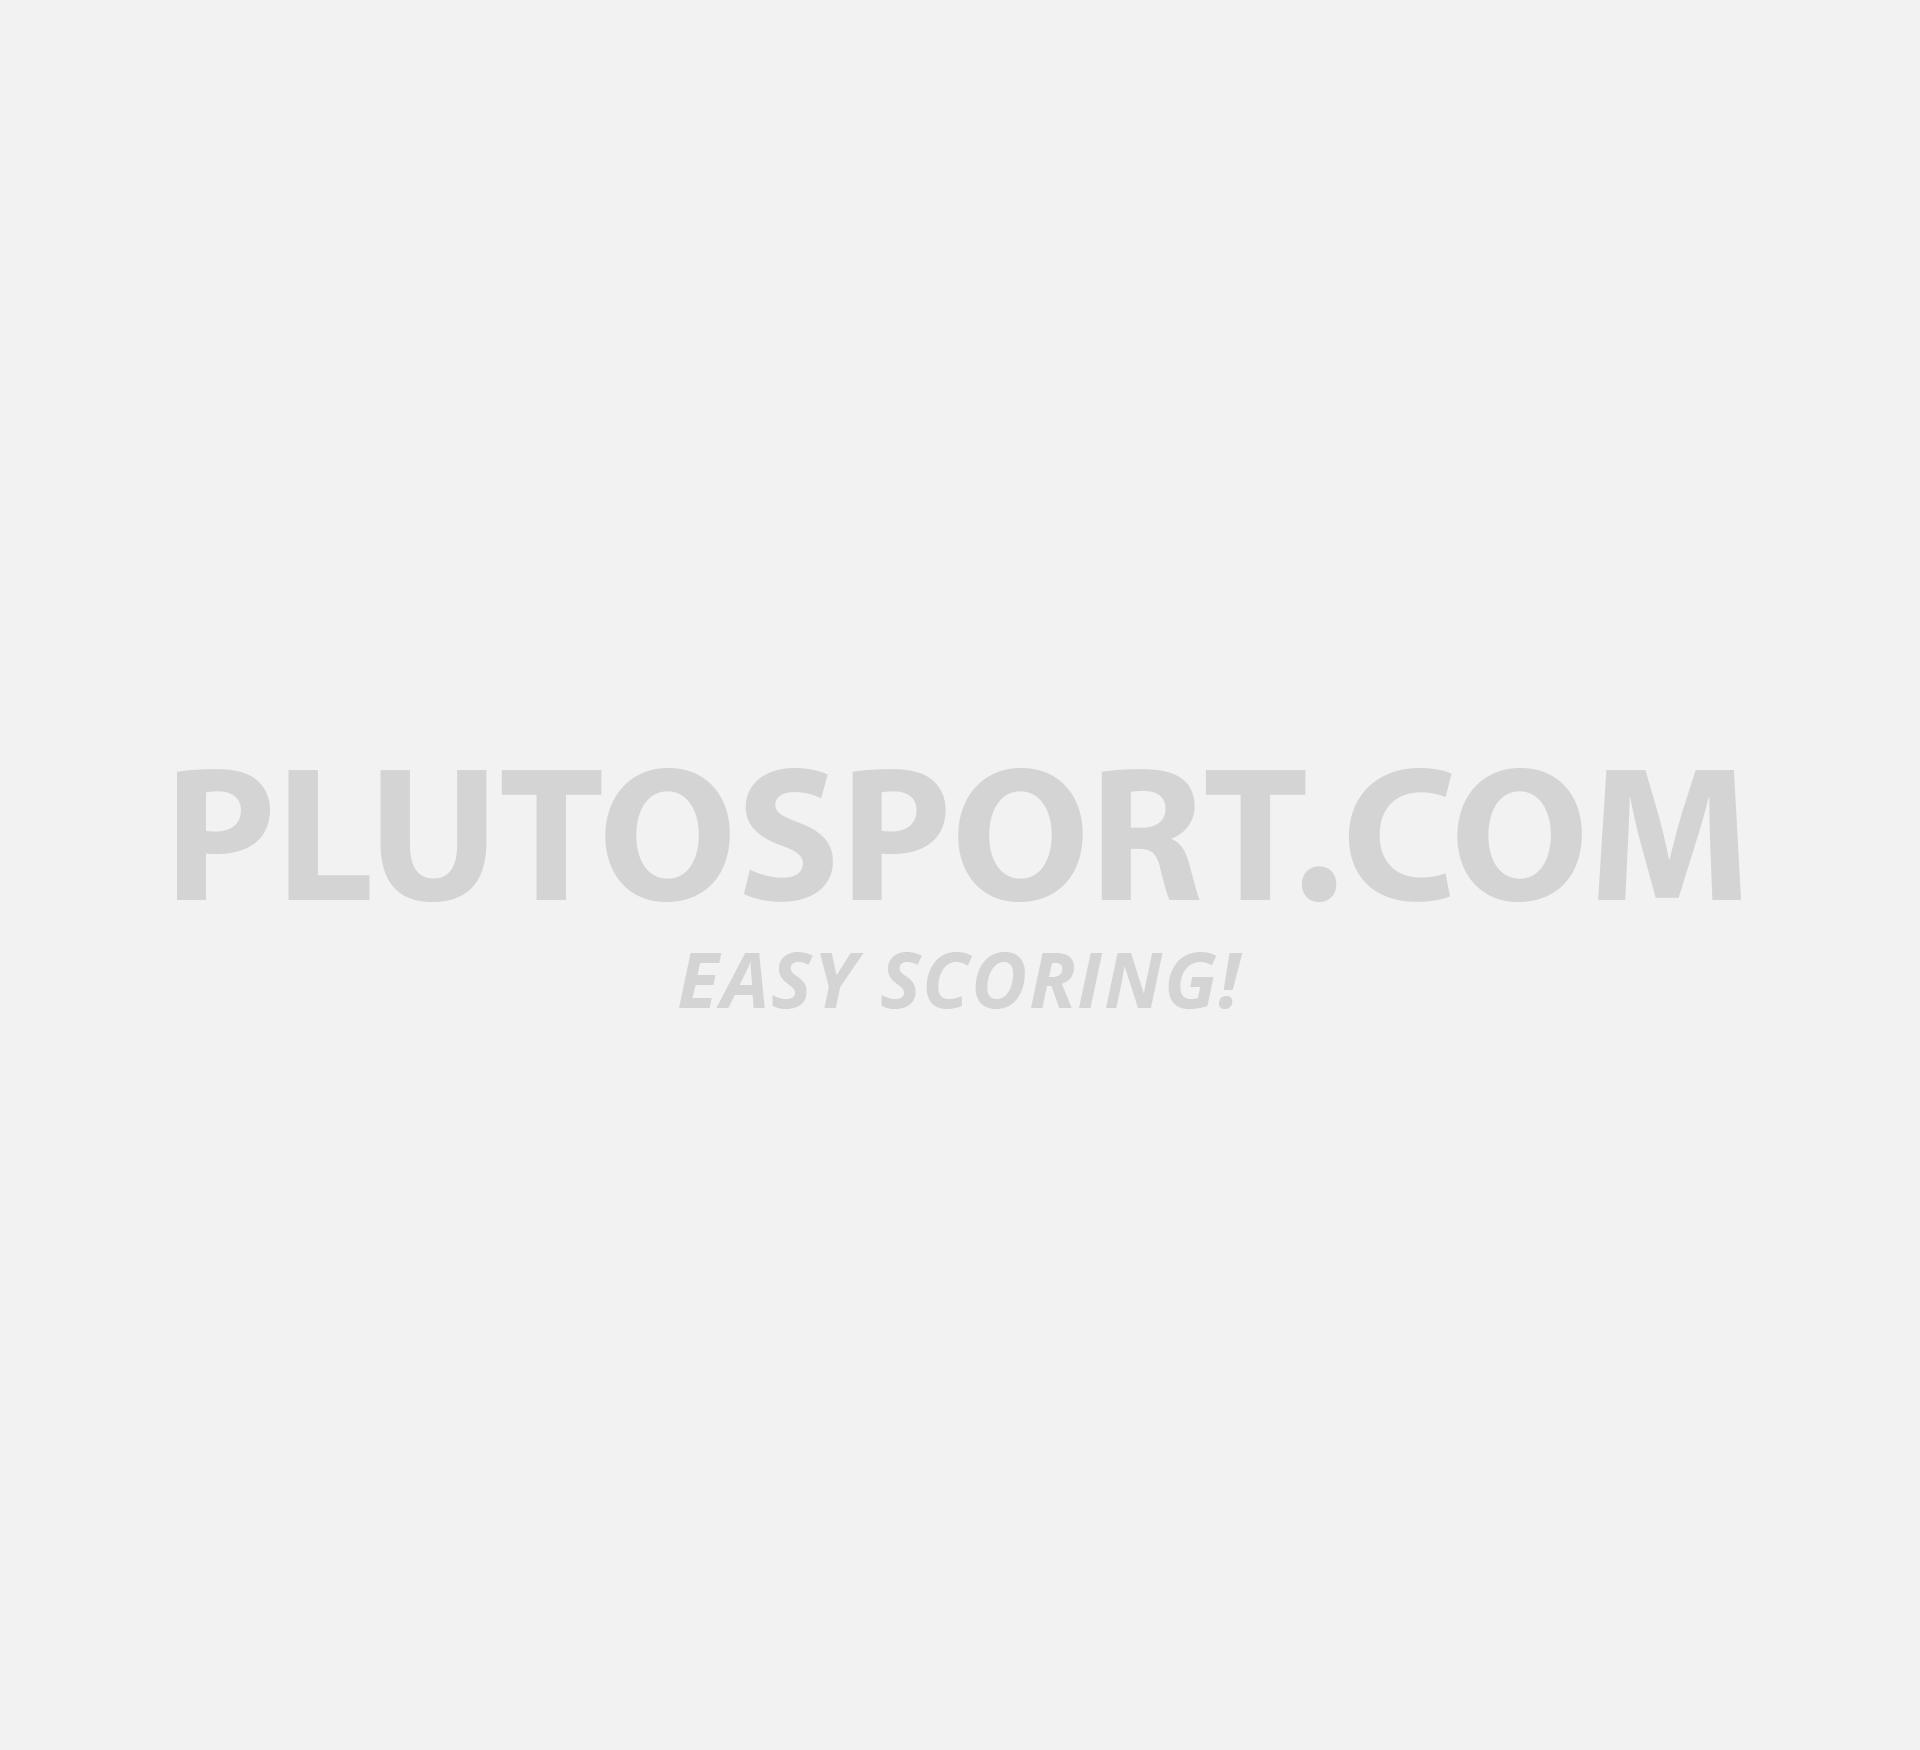 62821c00ec5c Adidas Sereno 14 Presentation Suit - Woven - Tracksuits - Clothing -  Football - Sports